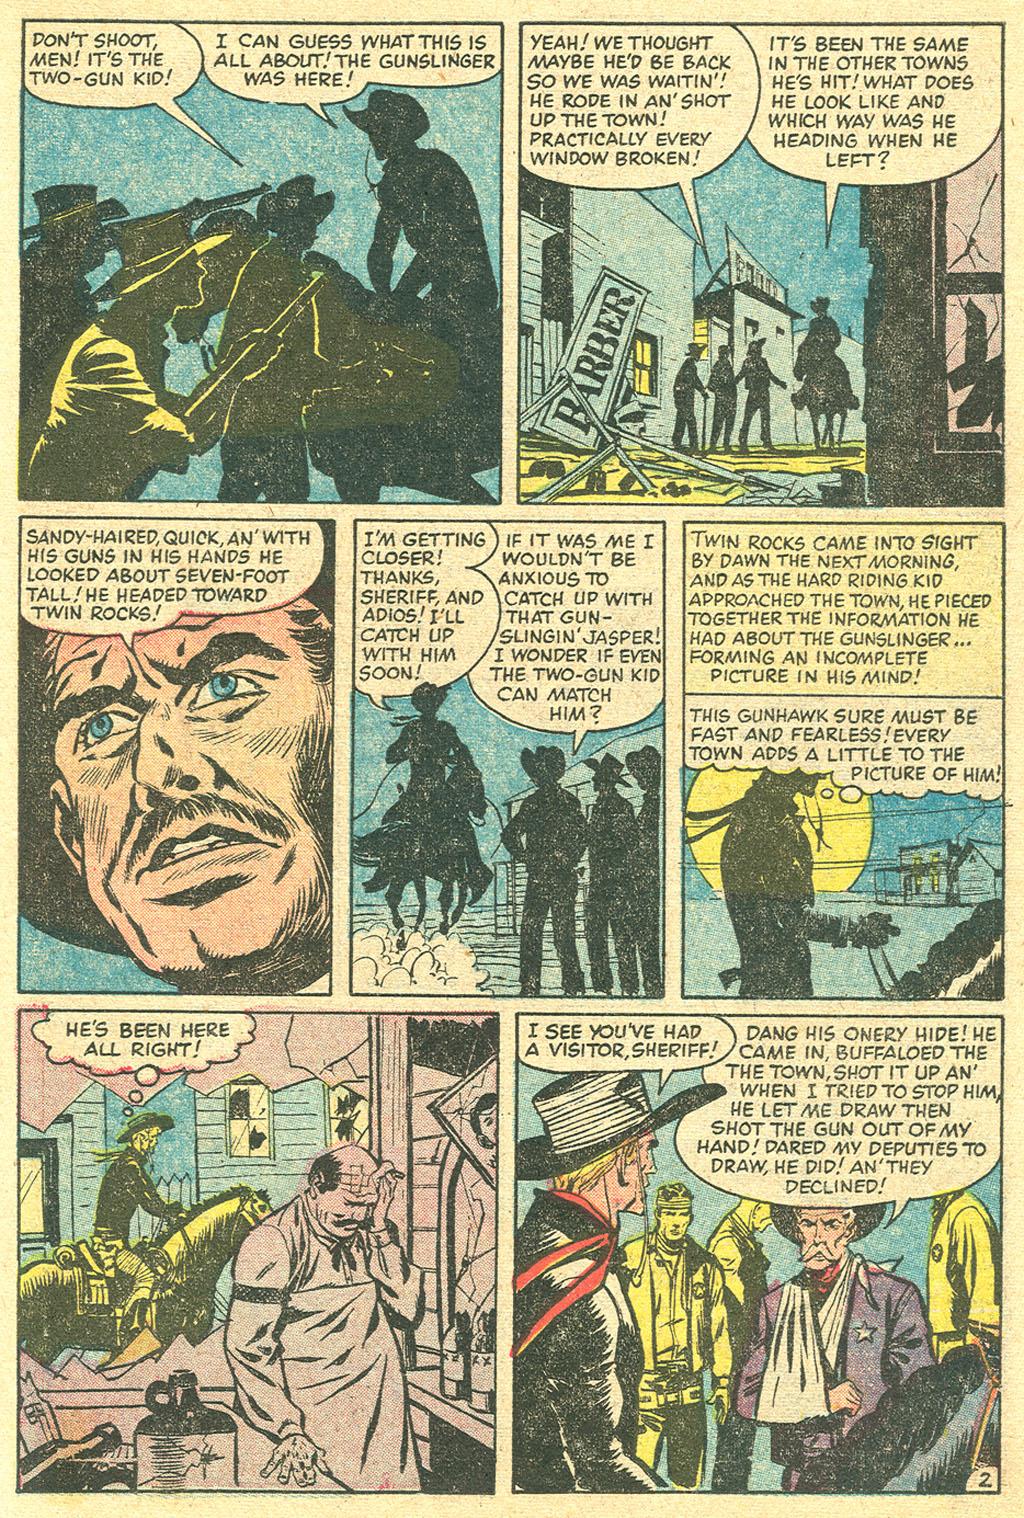 Read online Two-Gun Kid comic -  Issue #31 - 11